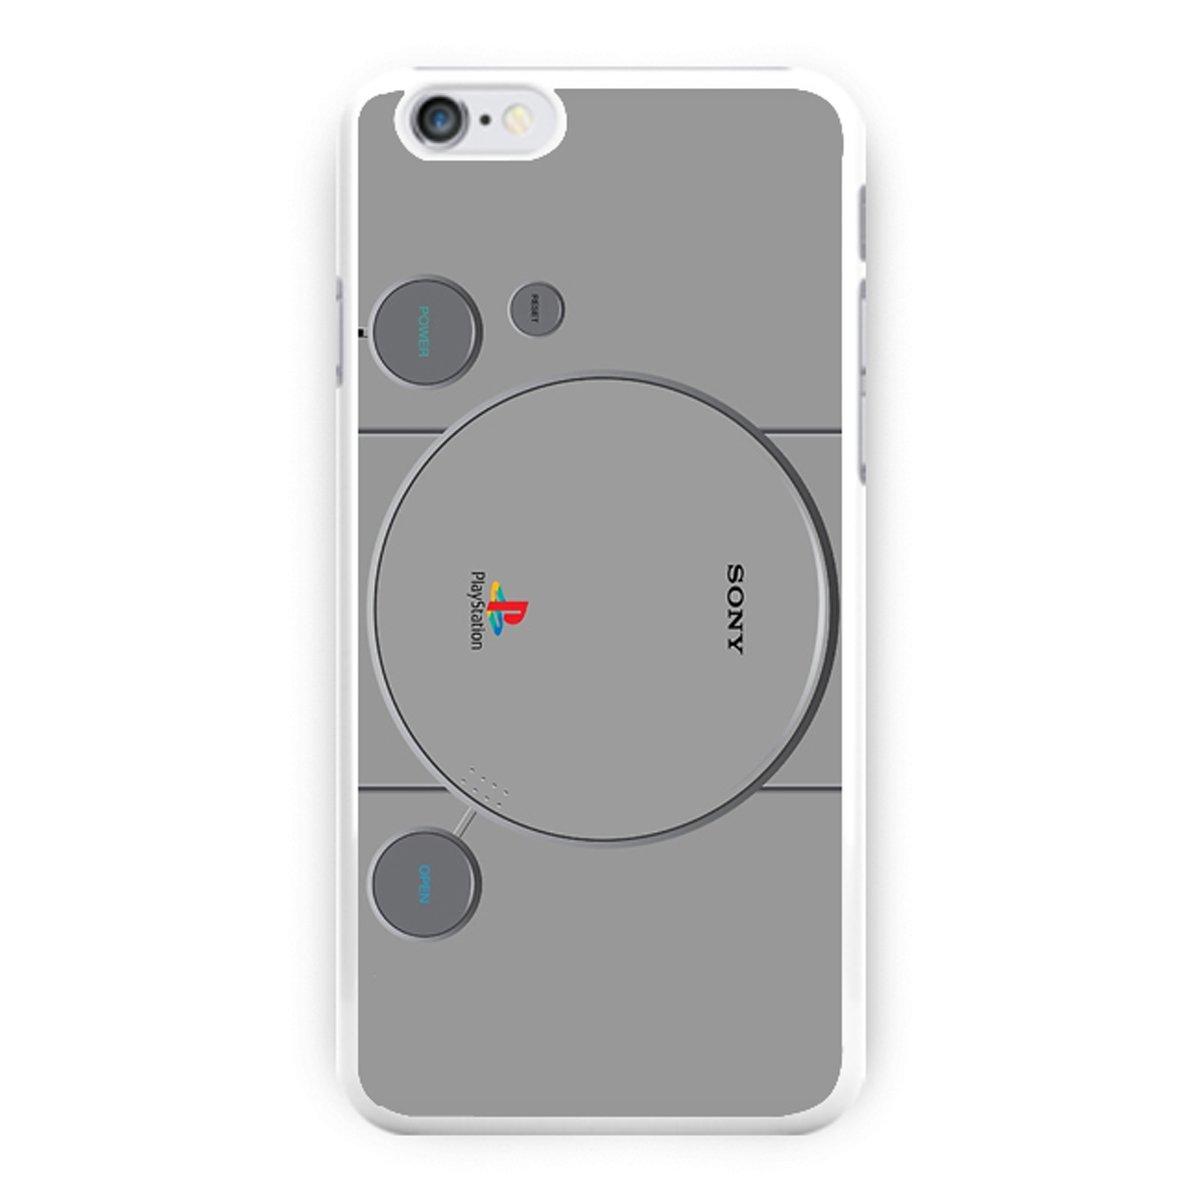 PSX iphone case